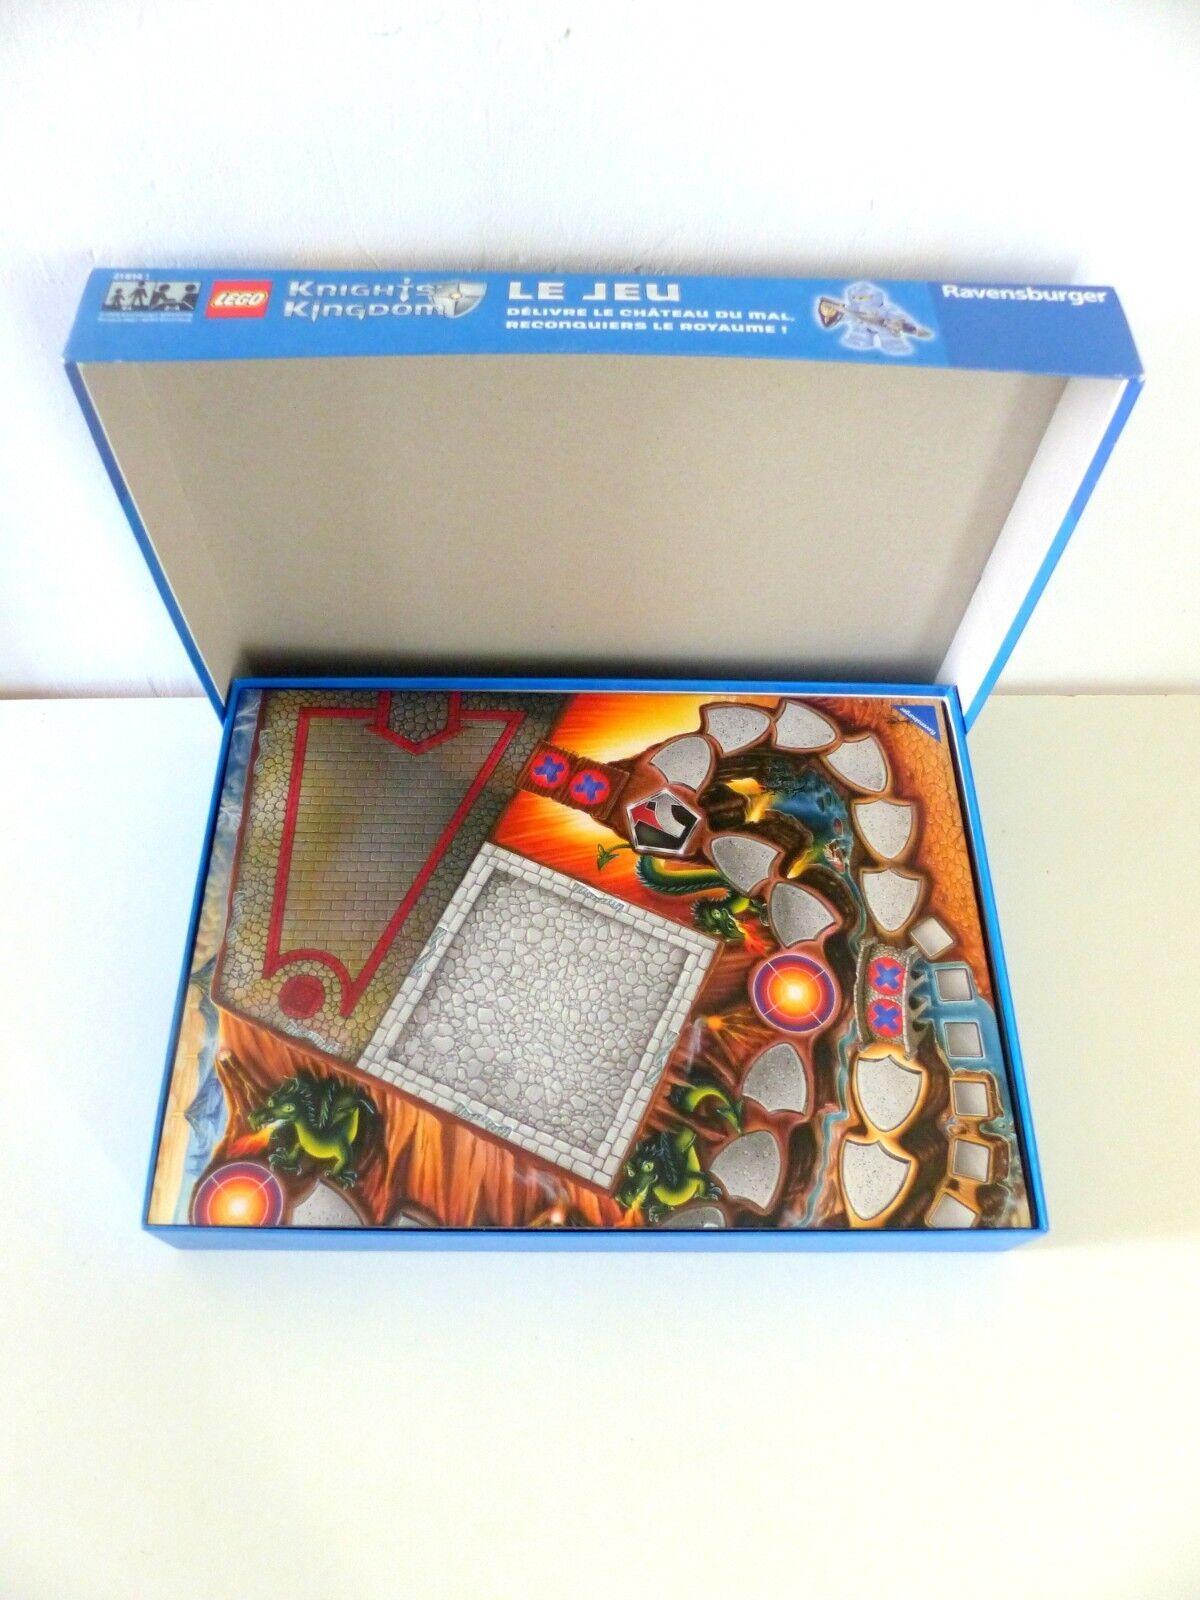 LEGO 21814 boite jeu Knights Kingdom rare complète set game game game player figure notice 1f5b49